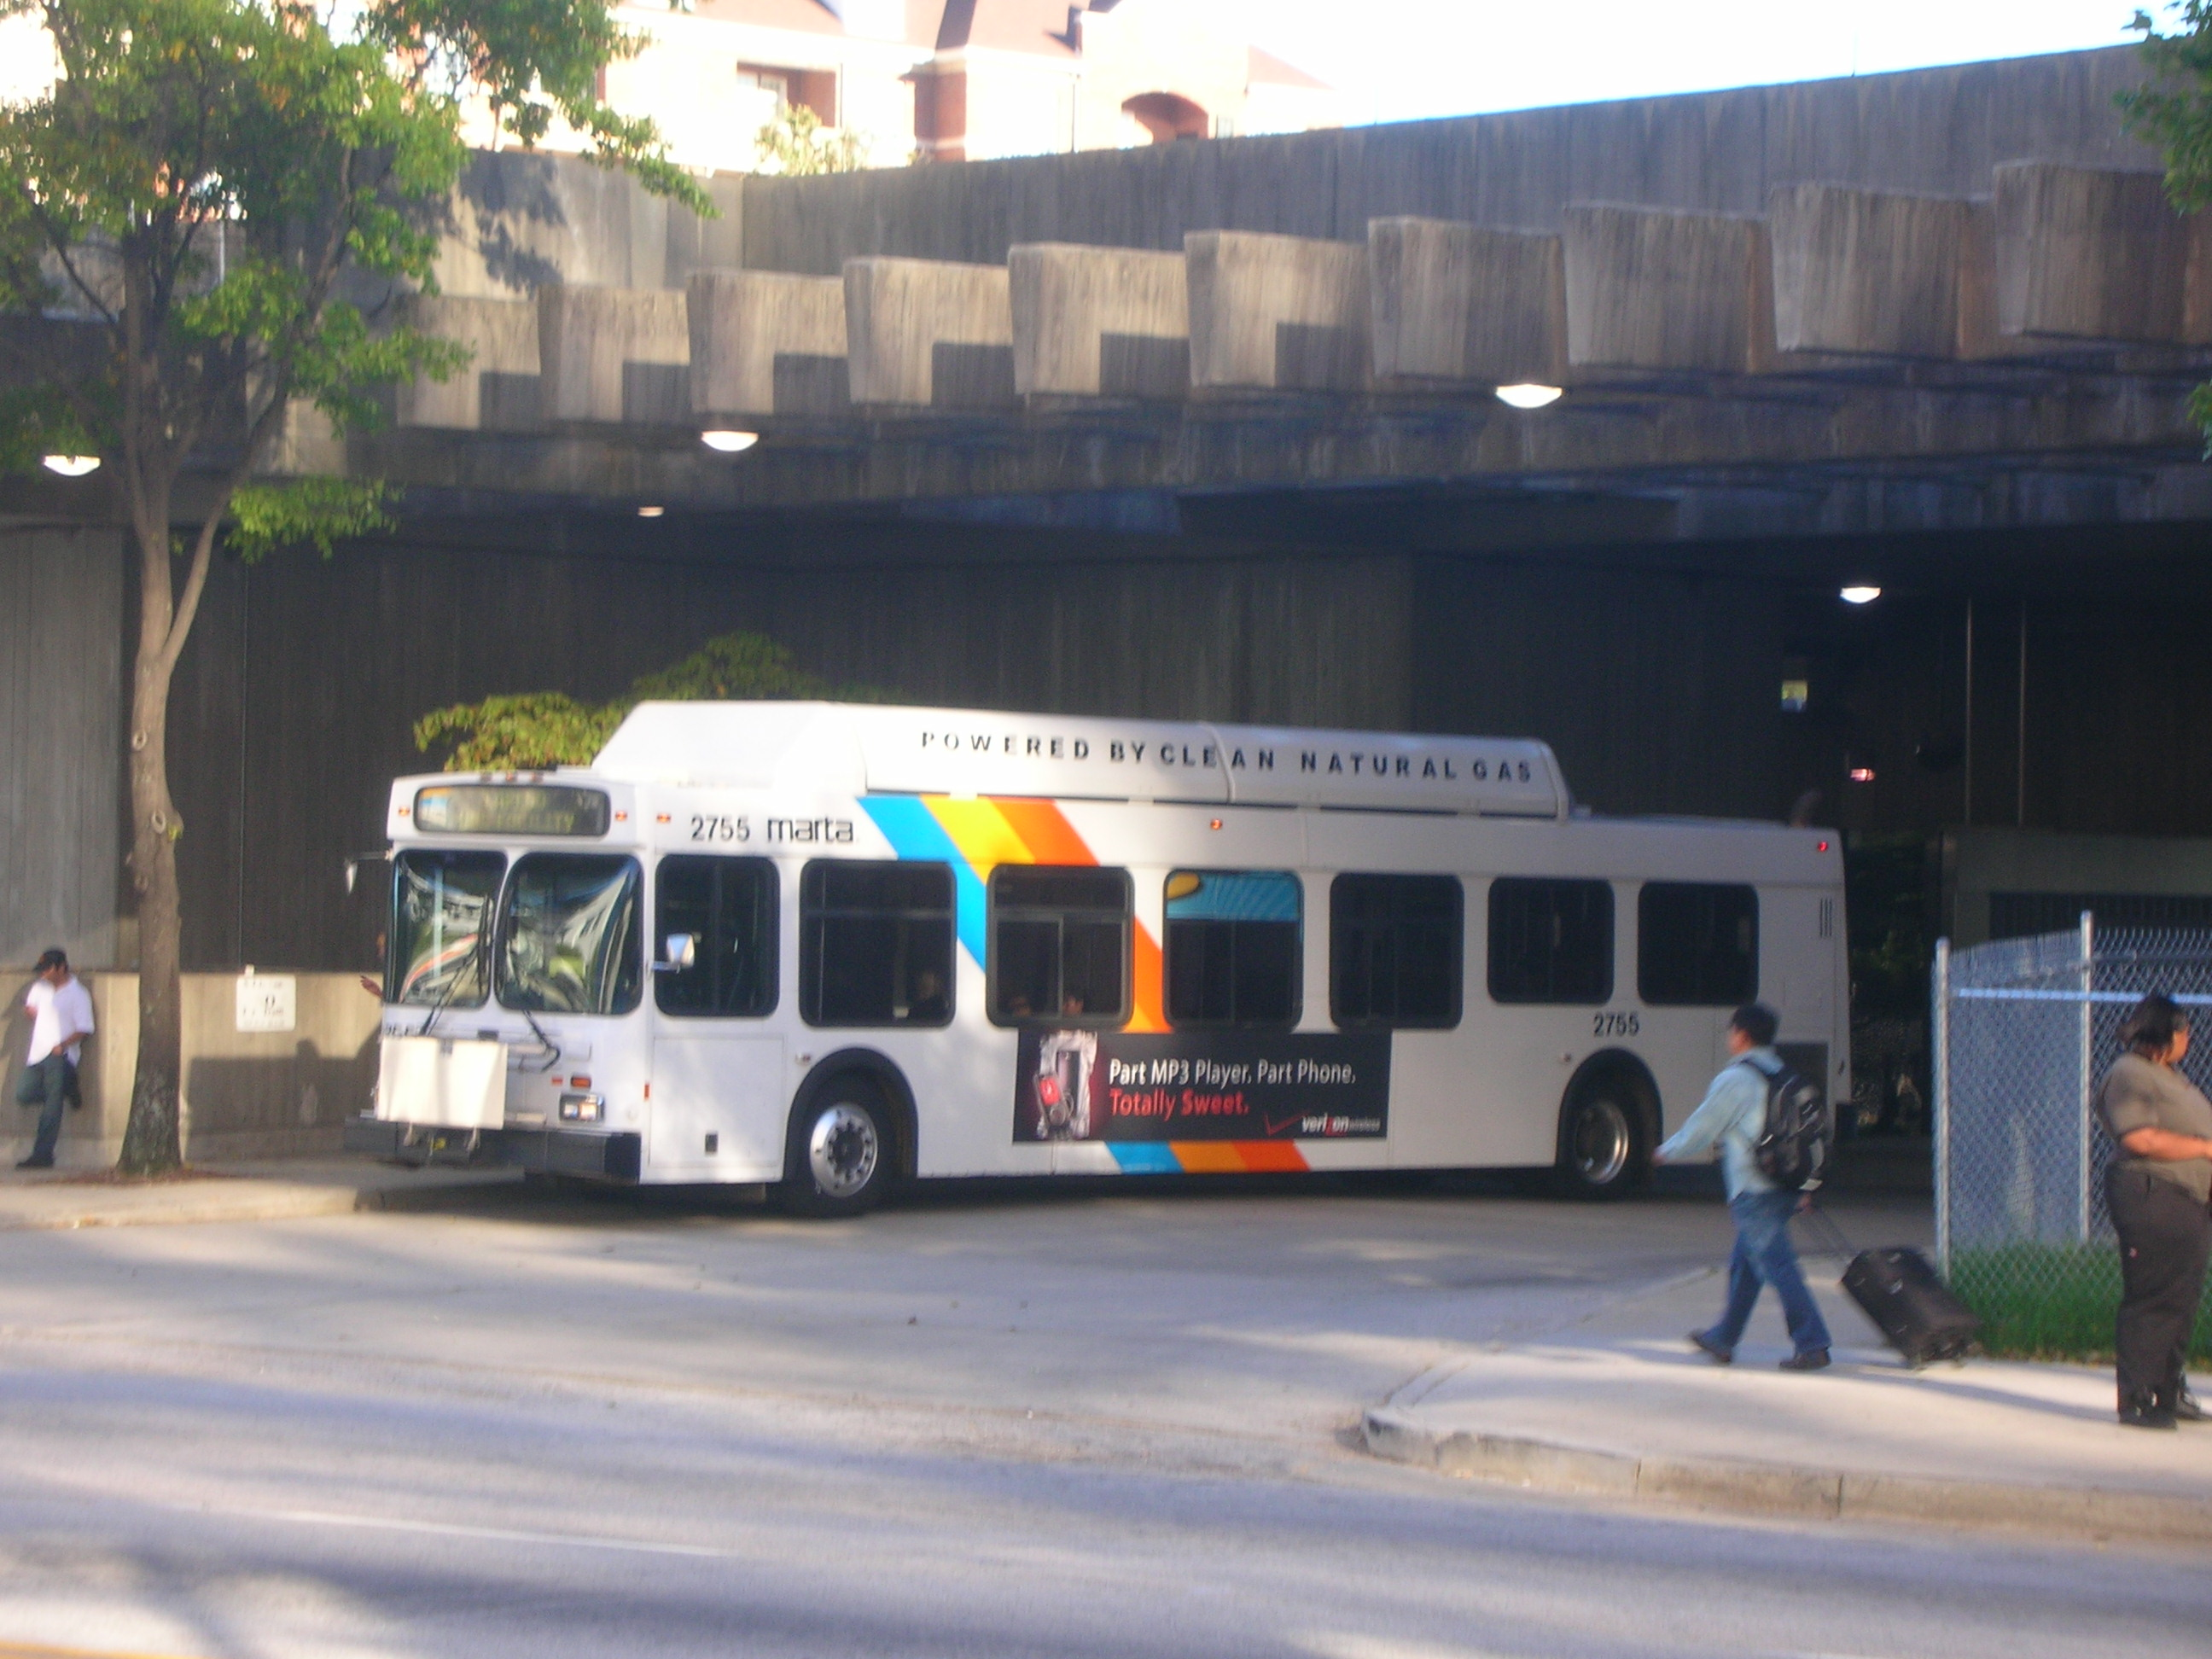 240 pace bus schedule pdf